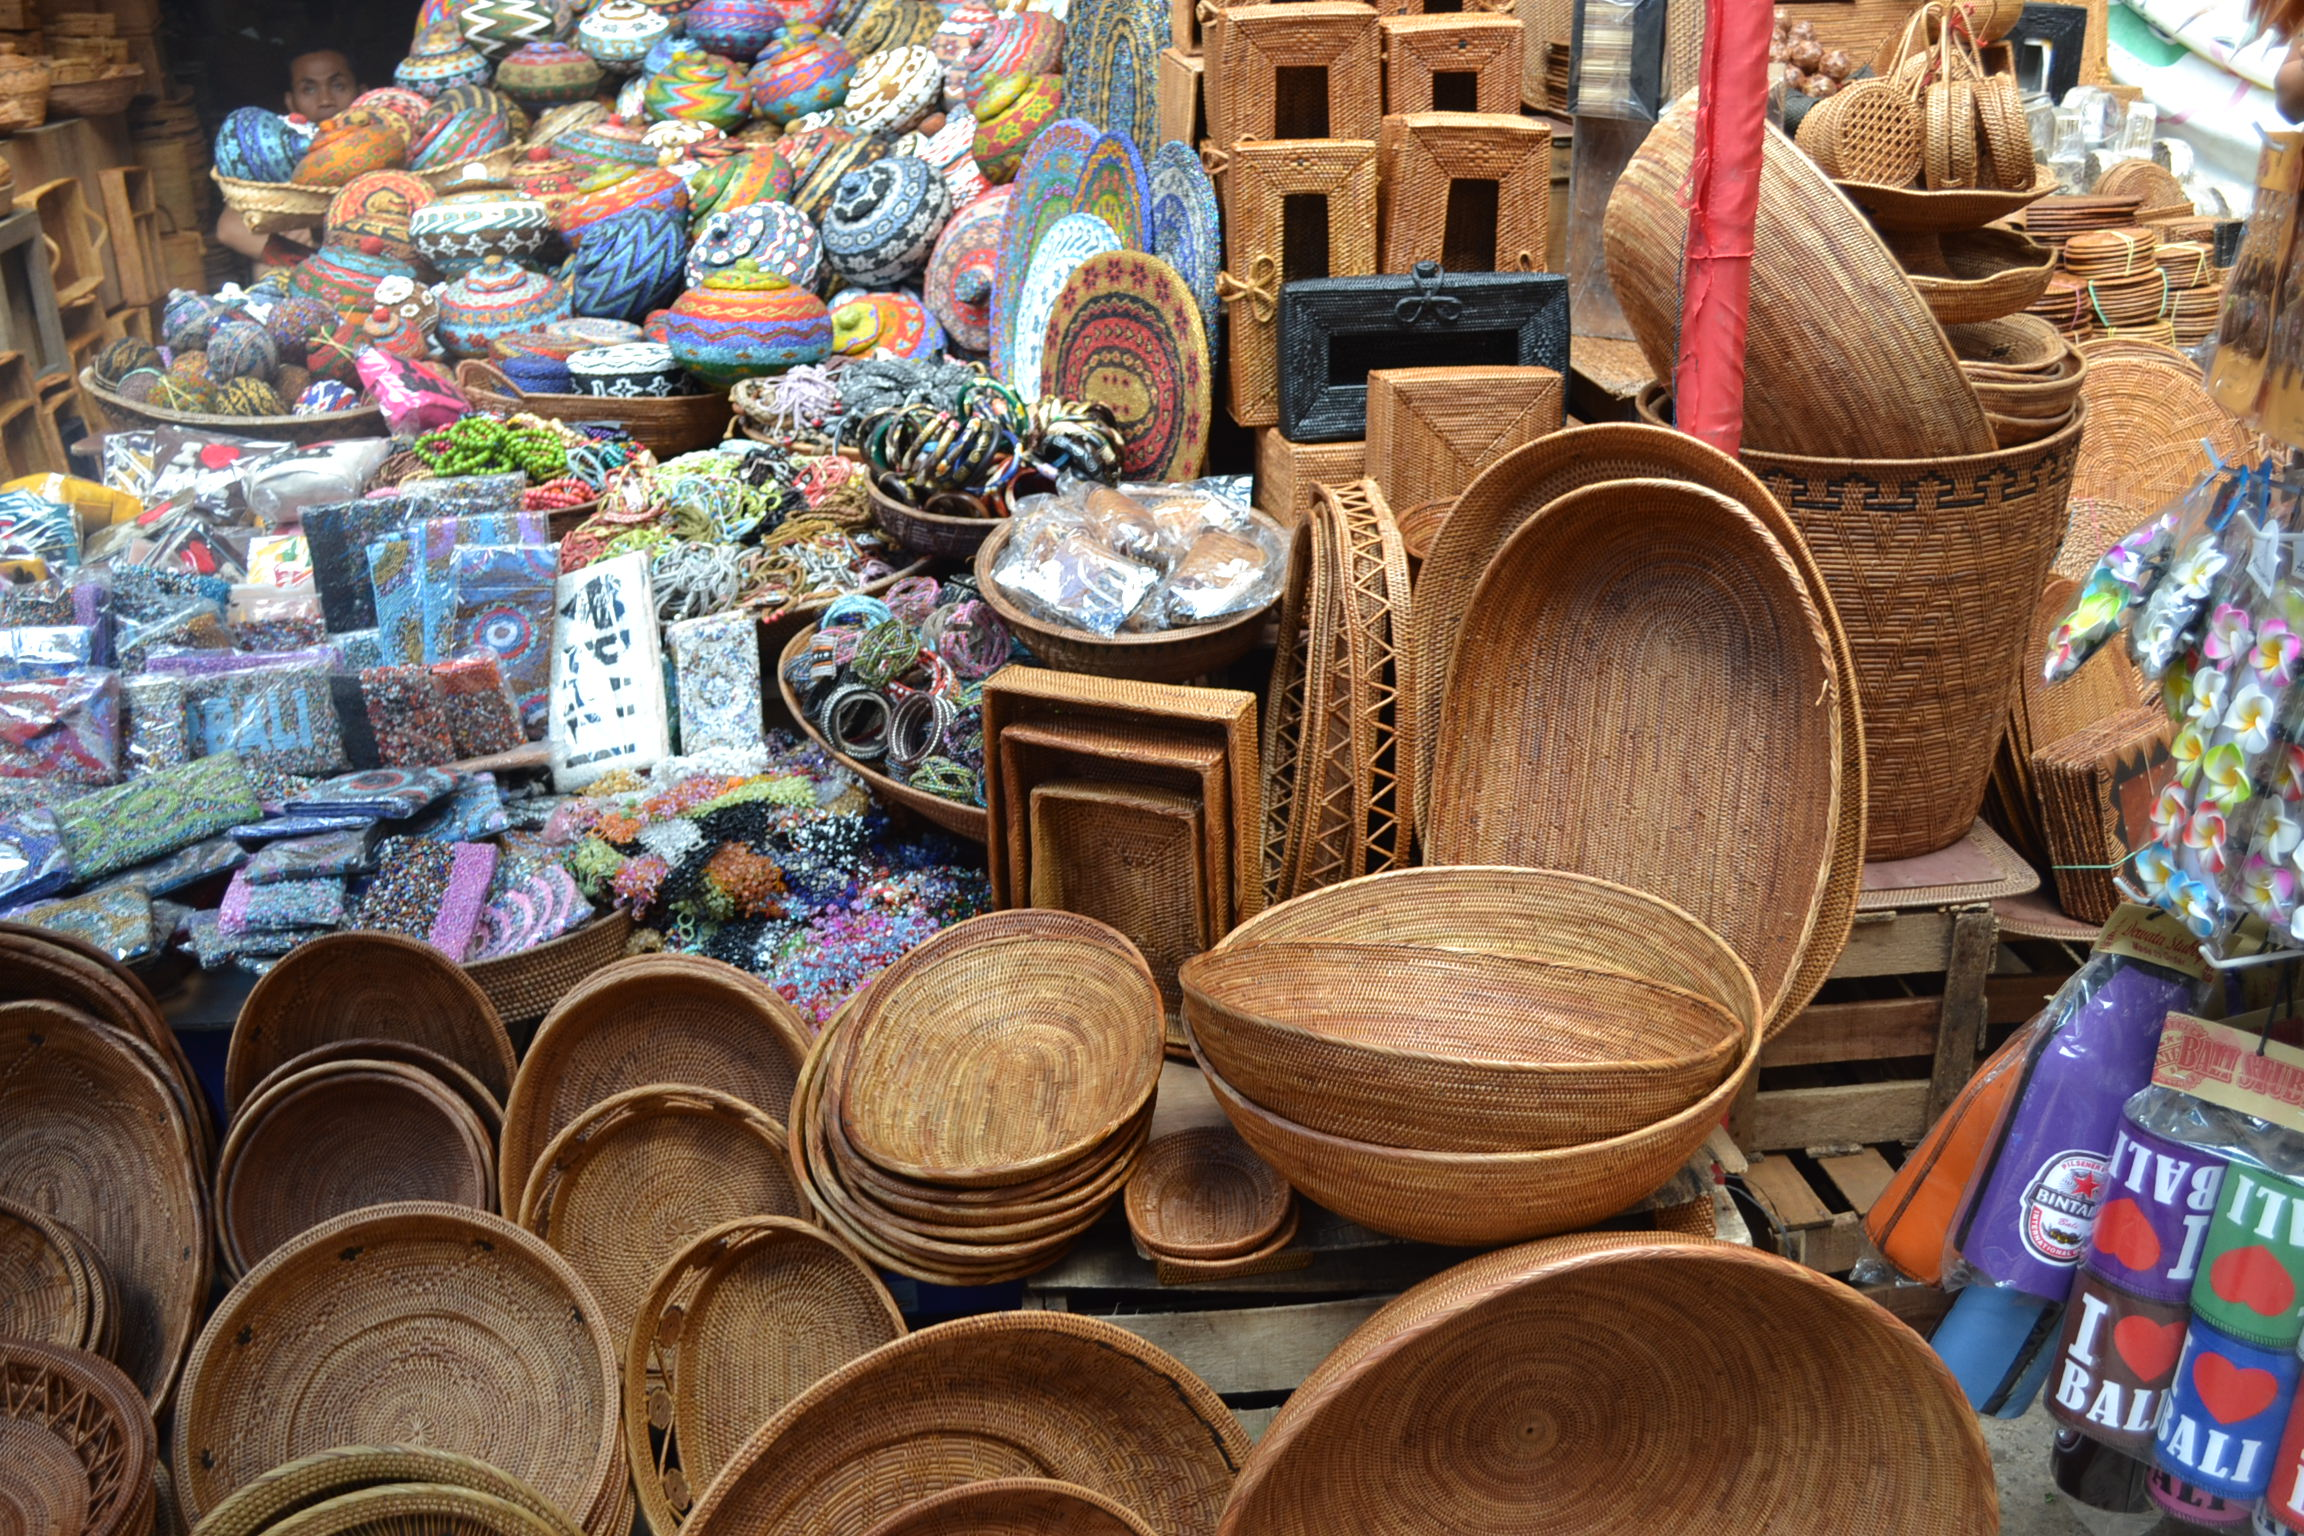 ubud traditional art market  ubud  bali  indonesia